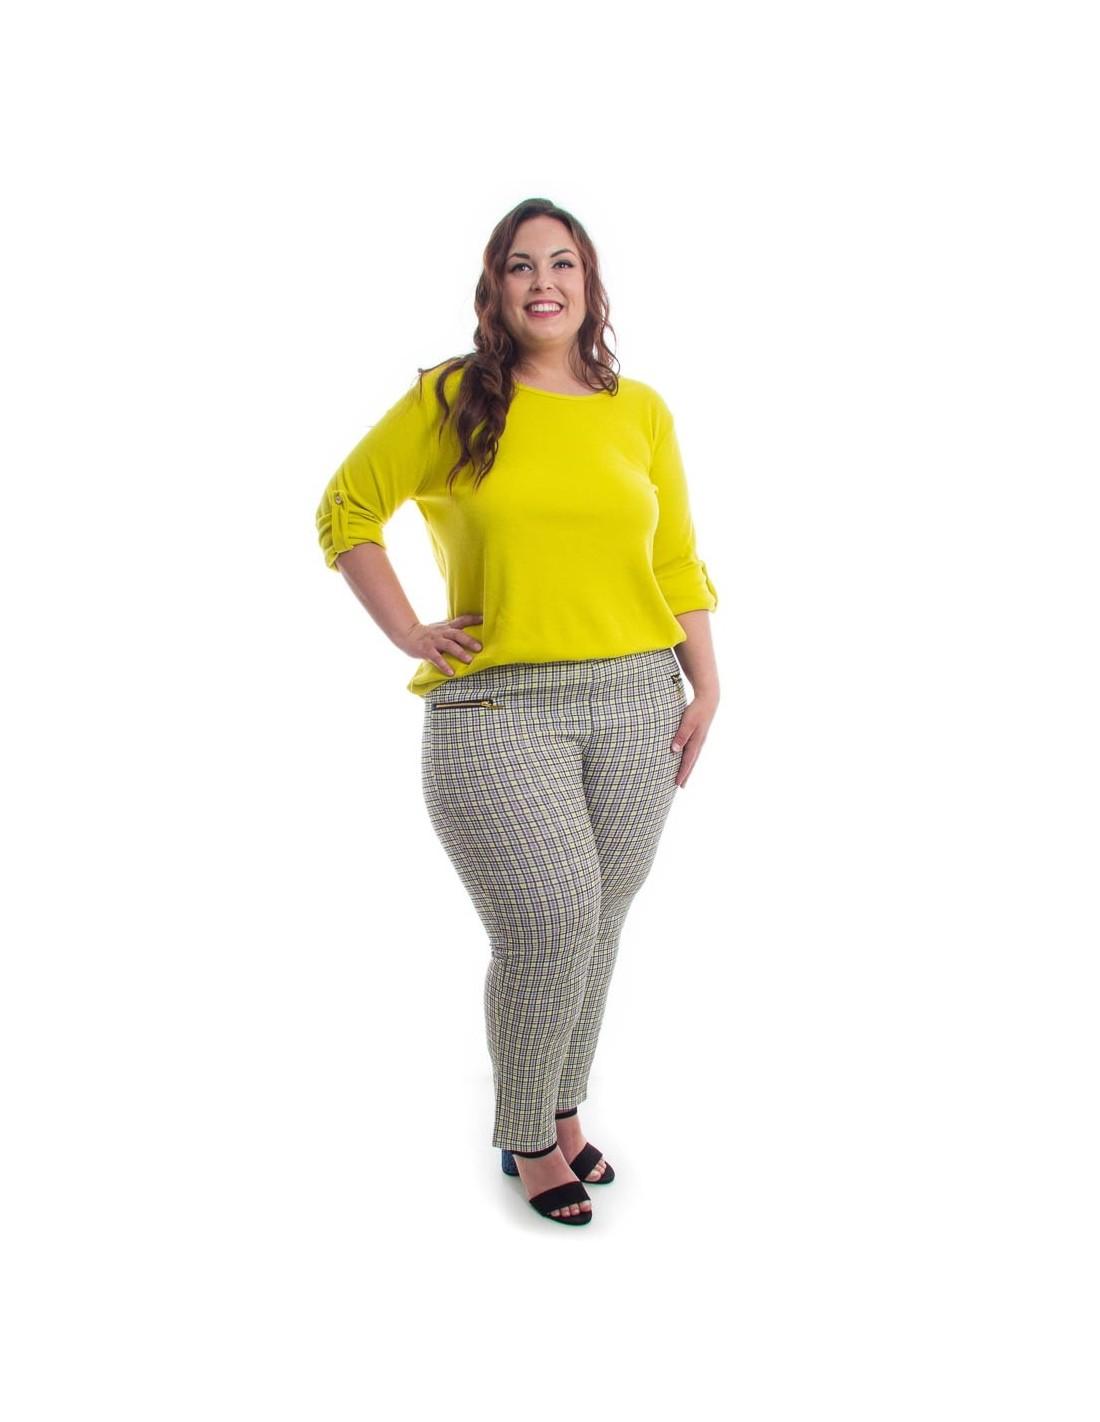 Comprar Pantalon A Cuadros En Tonos Amarillos Online Zadeshop